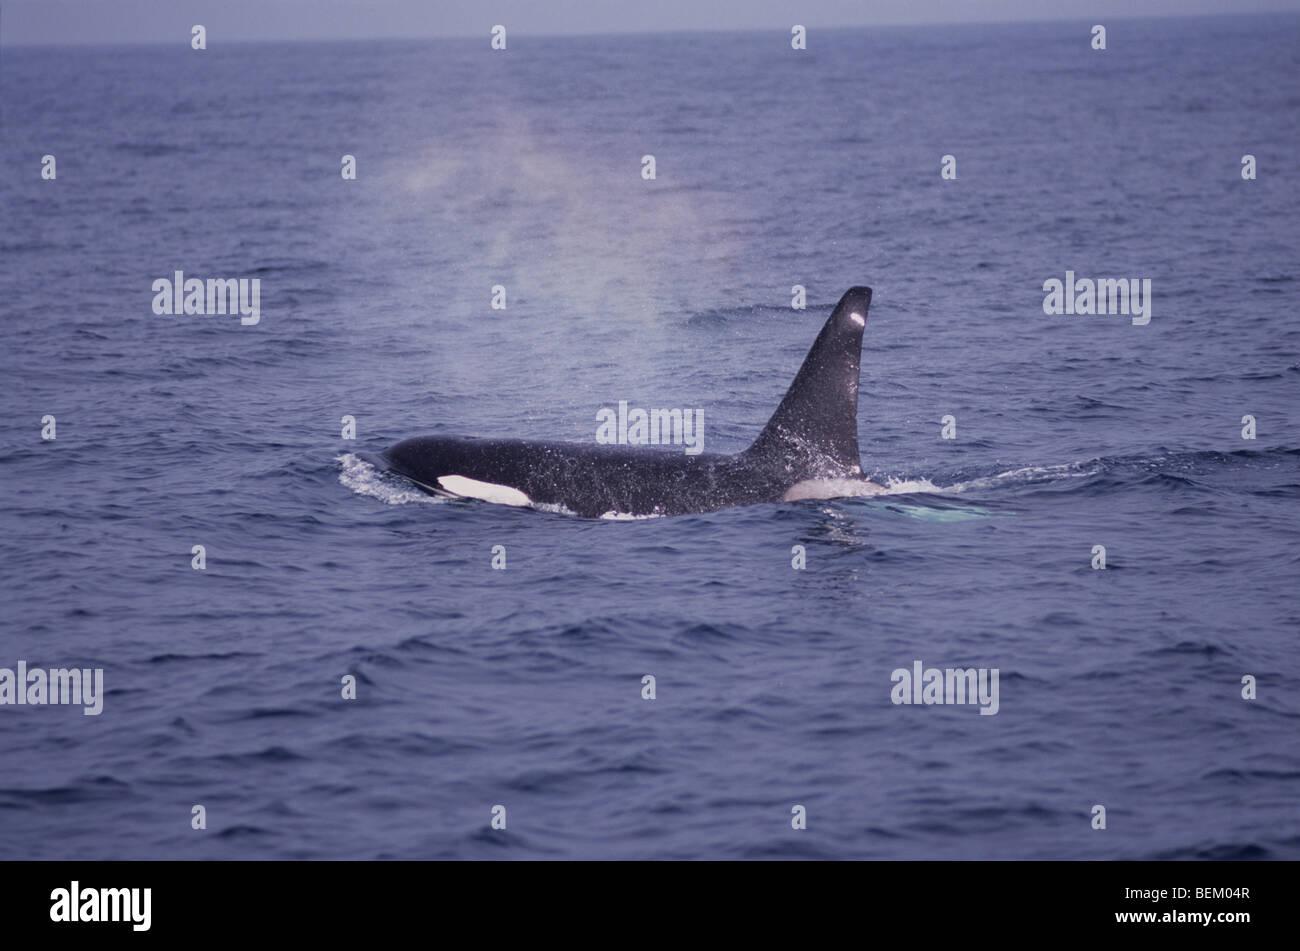 ORCA, KILLER WHALE BREATHING, MONTEREY BAY, CALIFORNIA, U.S.A. Stock Photo